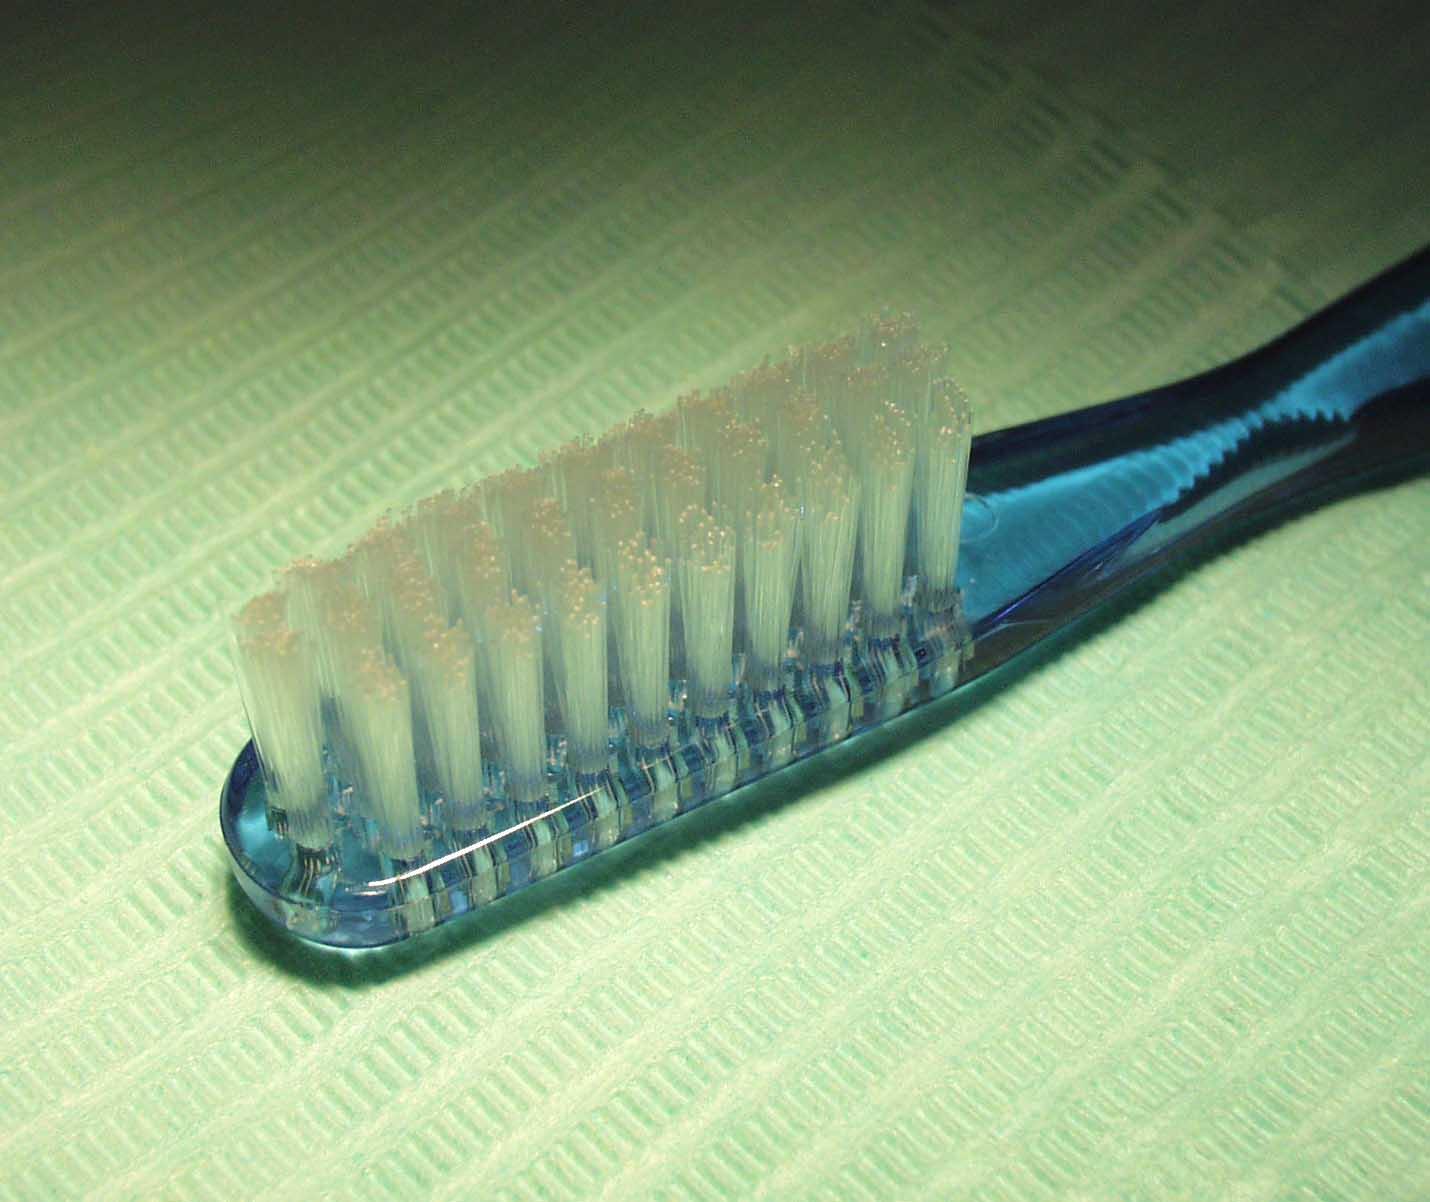 igiene - spazzolino